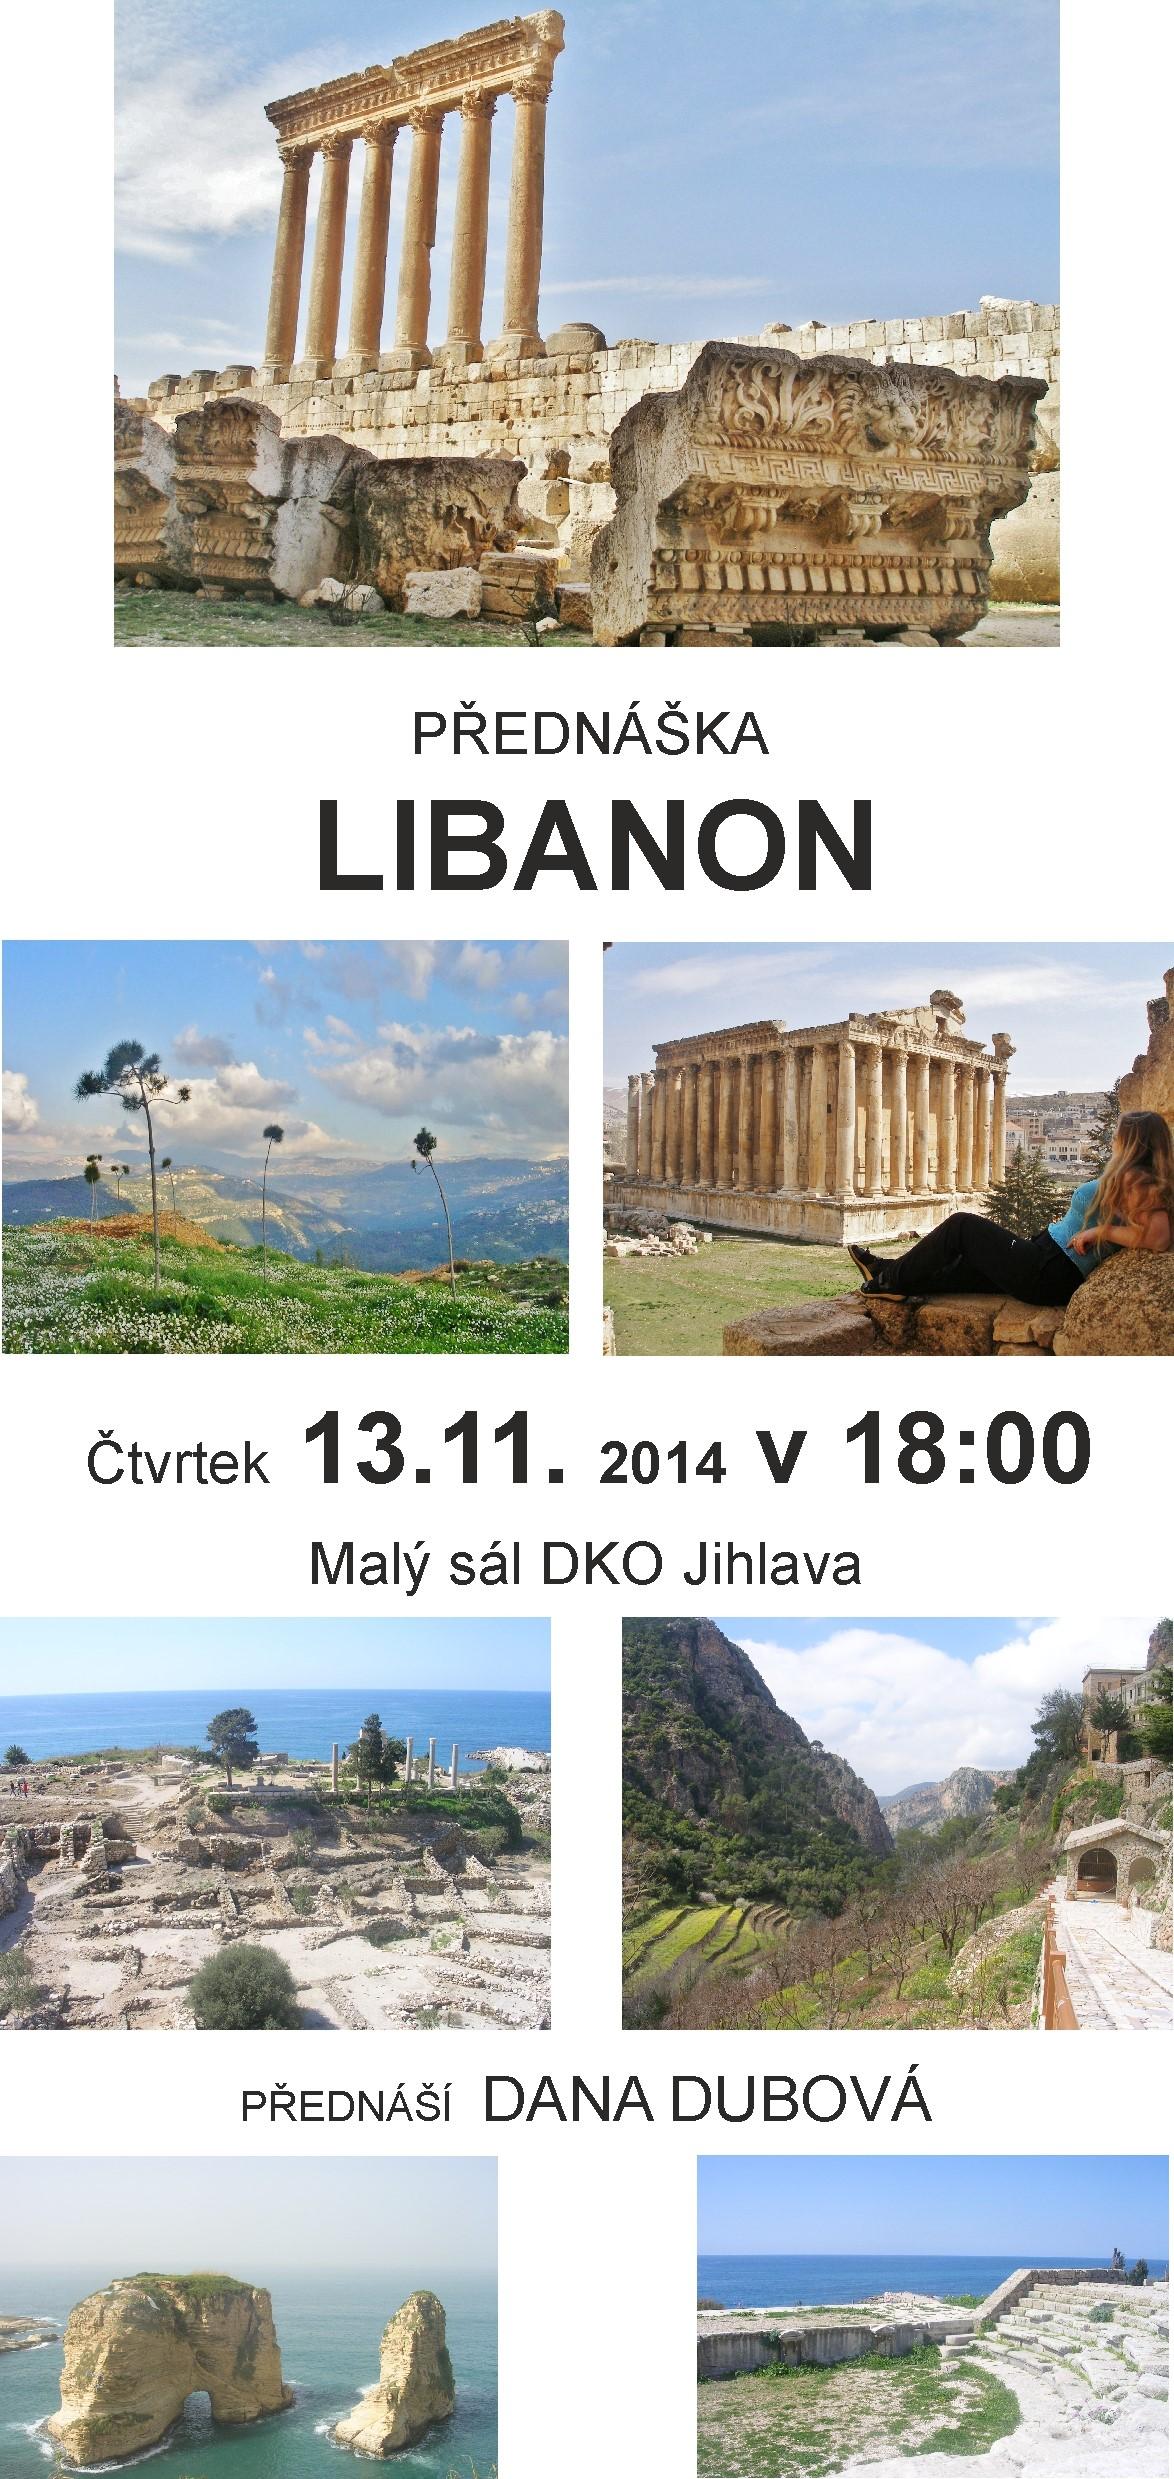 LIBANON 13.11.2014